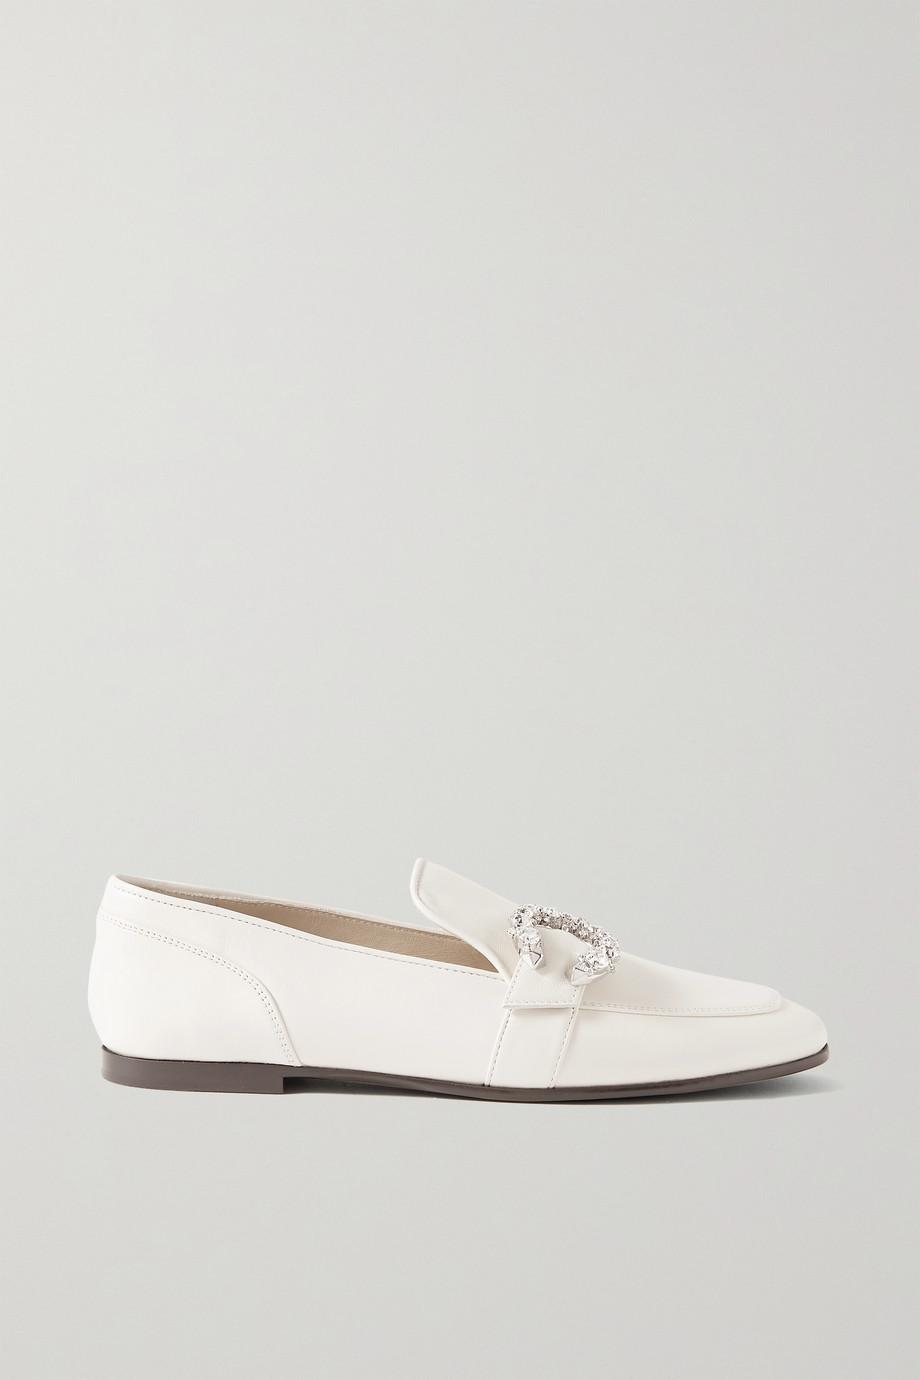 Jimmy Choo Mani crystal-embellished leather loafers